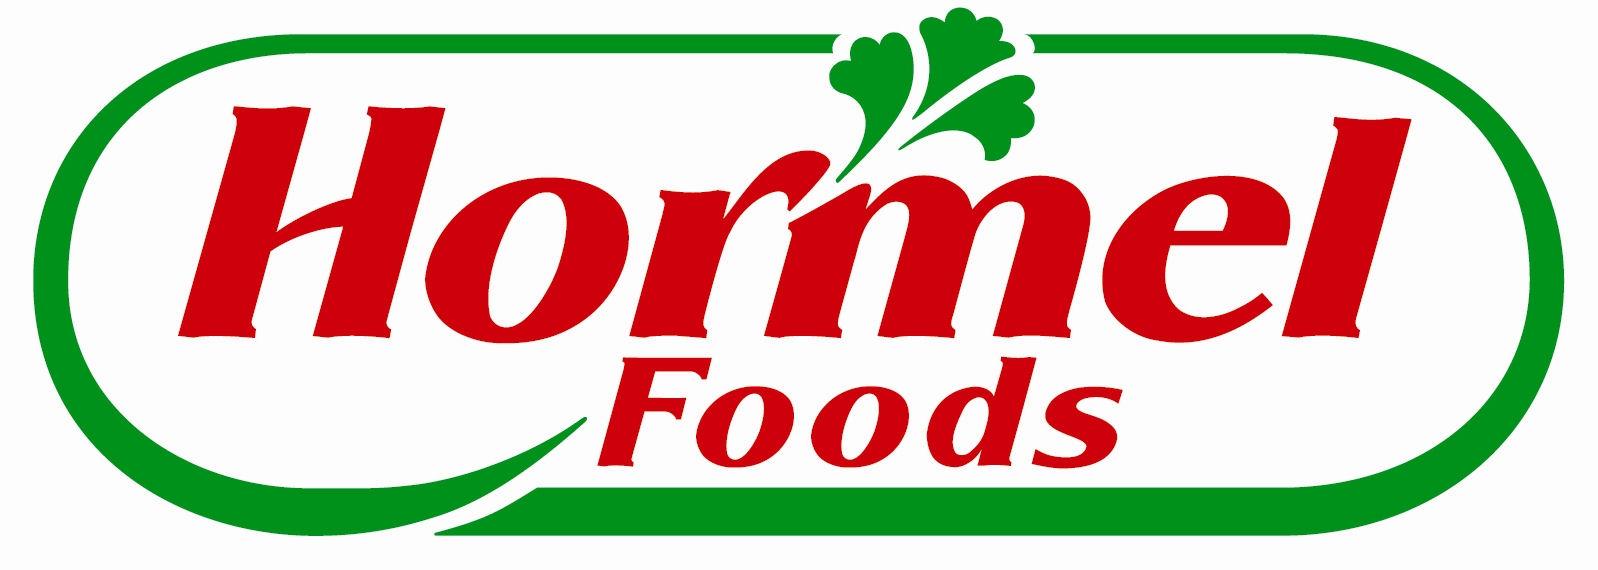 Hormel_Logo.jpg